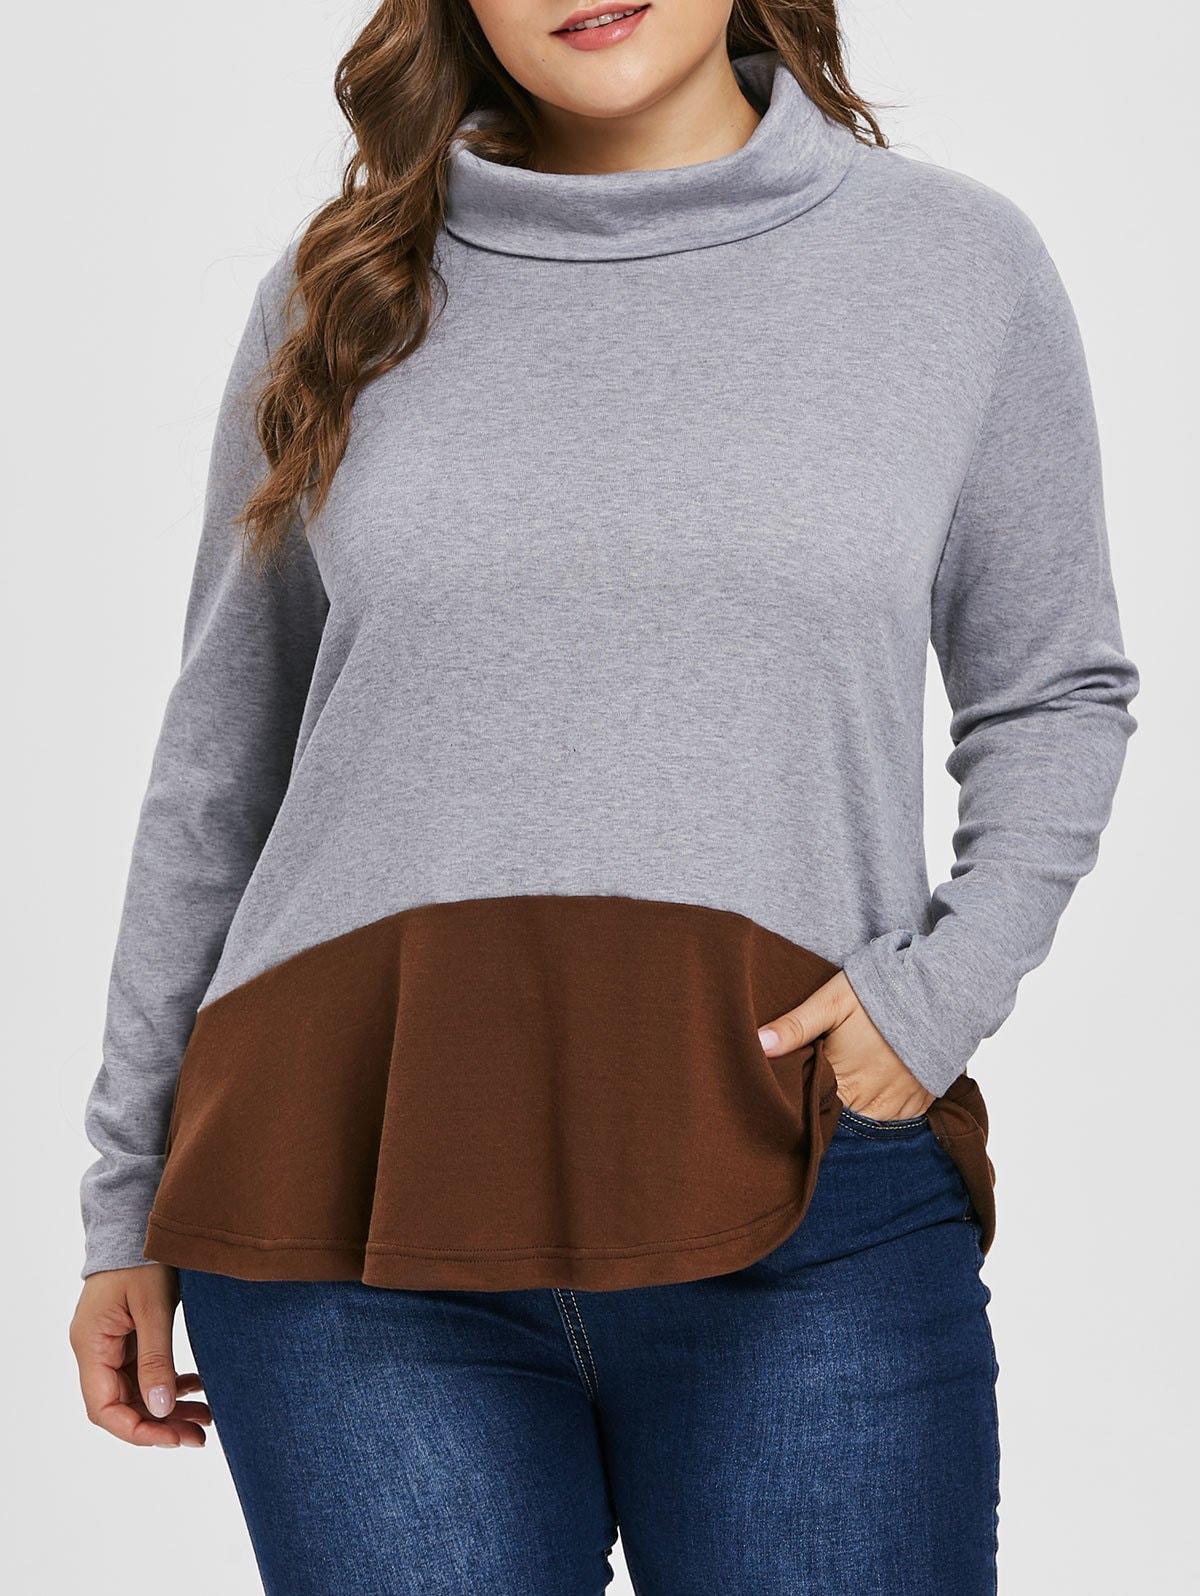 Turtleneck Plus Size Color Block Sweatshirt